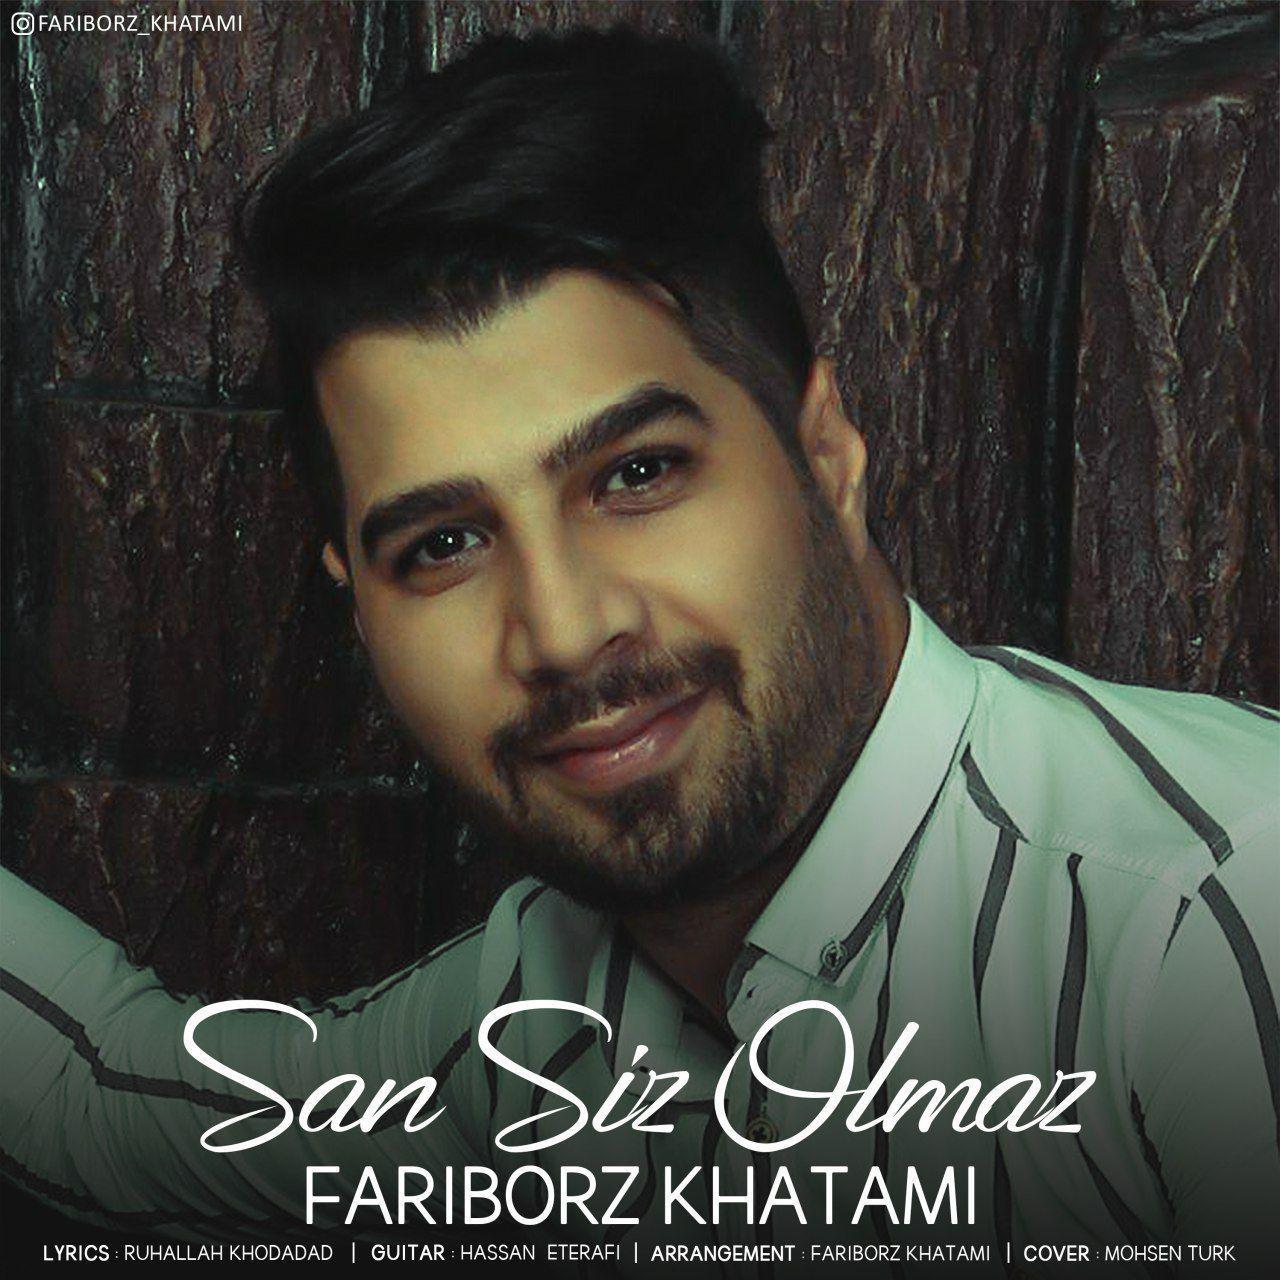 Fariborz Khatami - San Siz Olmaz